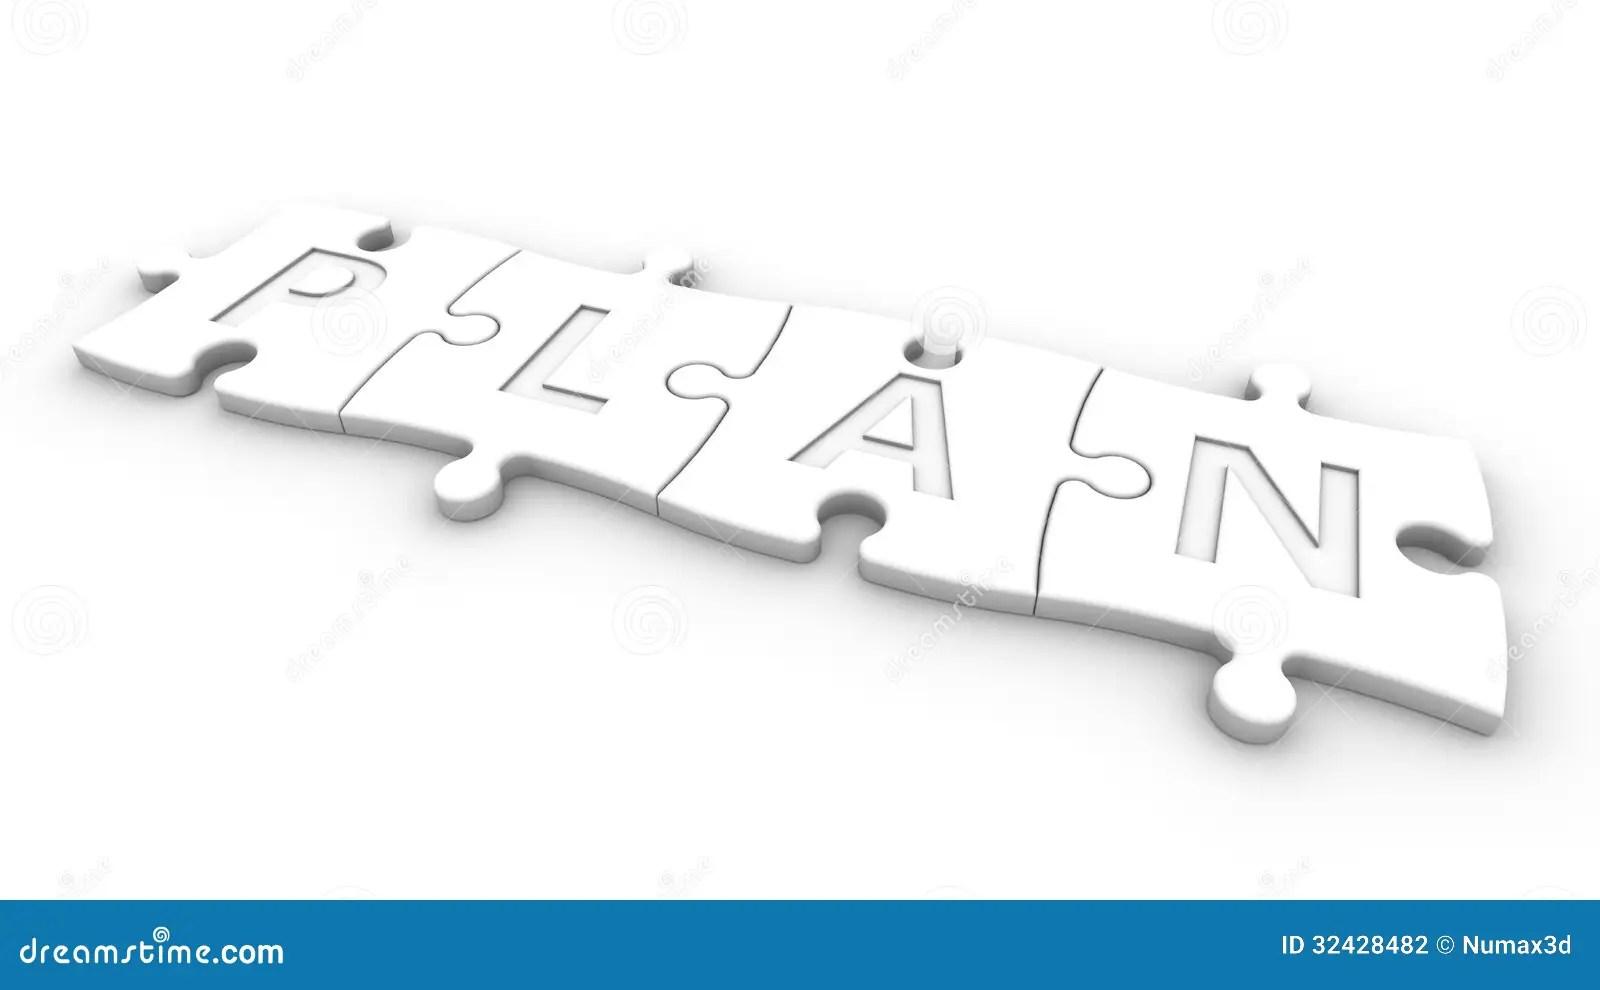 Plan stock illustration. Illustration of crossword